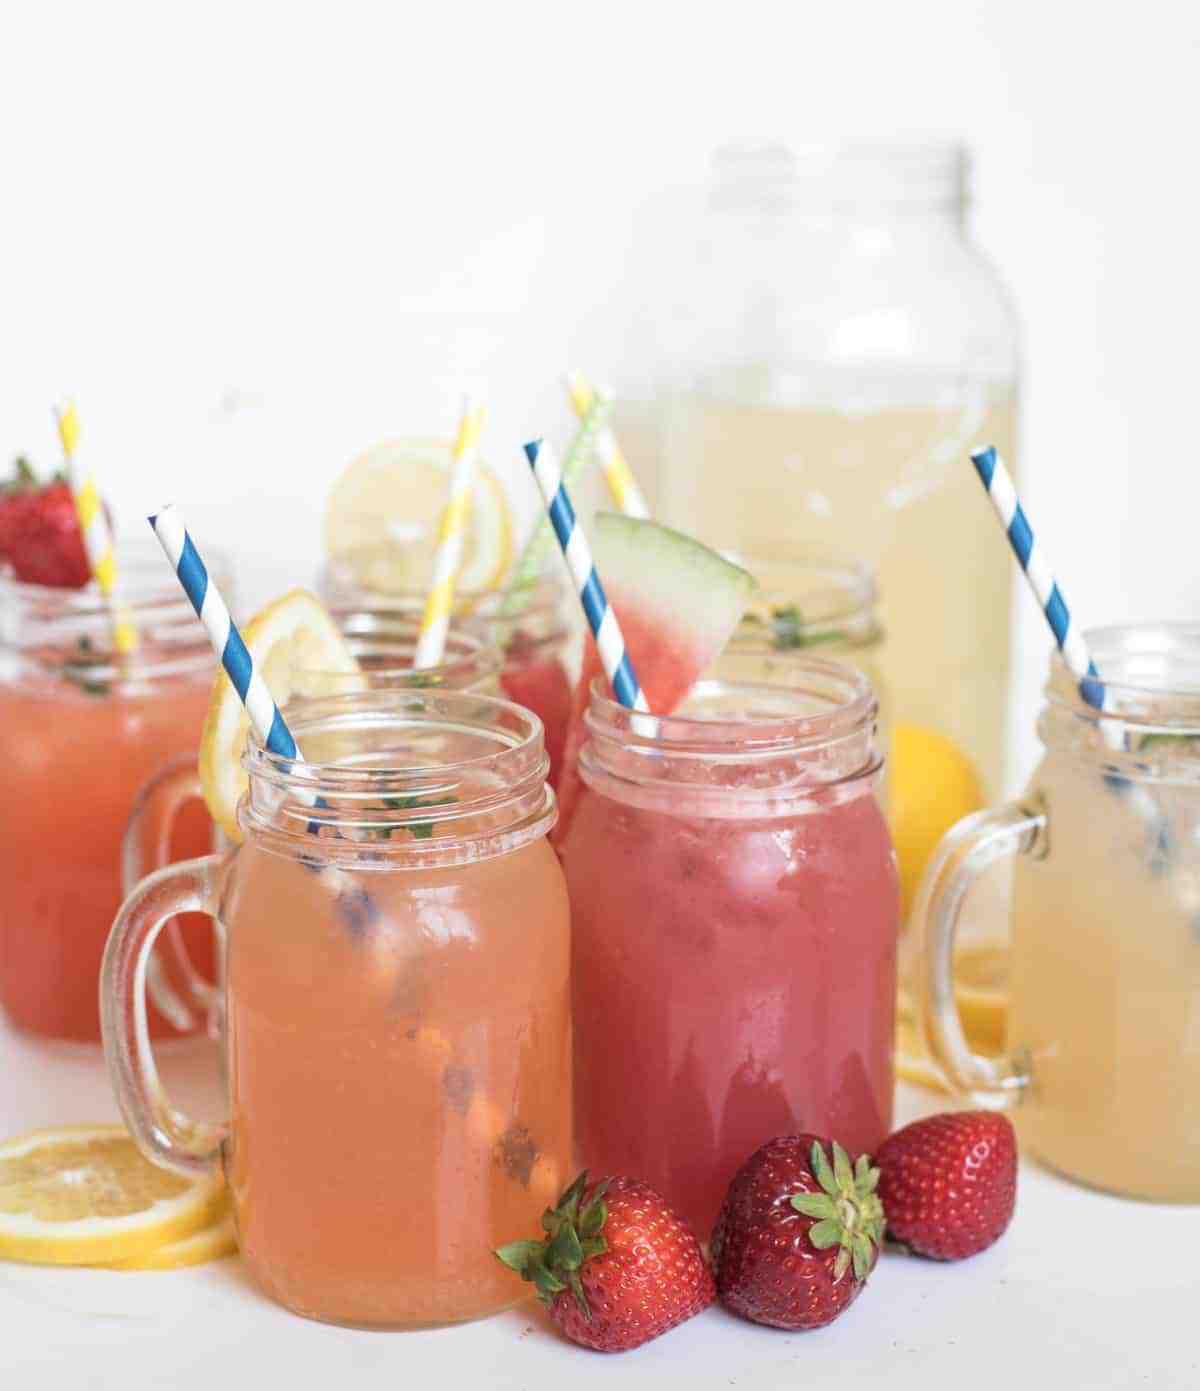 8 Different Homemade Lemonade Recipes all in one place! Learn how to make lemonade with fresh lemons or lemon juice in varieties like strawberry lemonade, raspberry lemonade, and even watermelon and tropical lemonade.